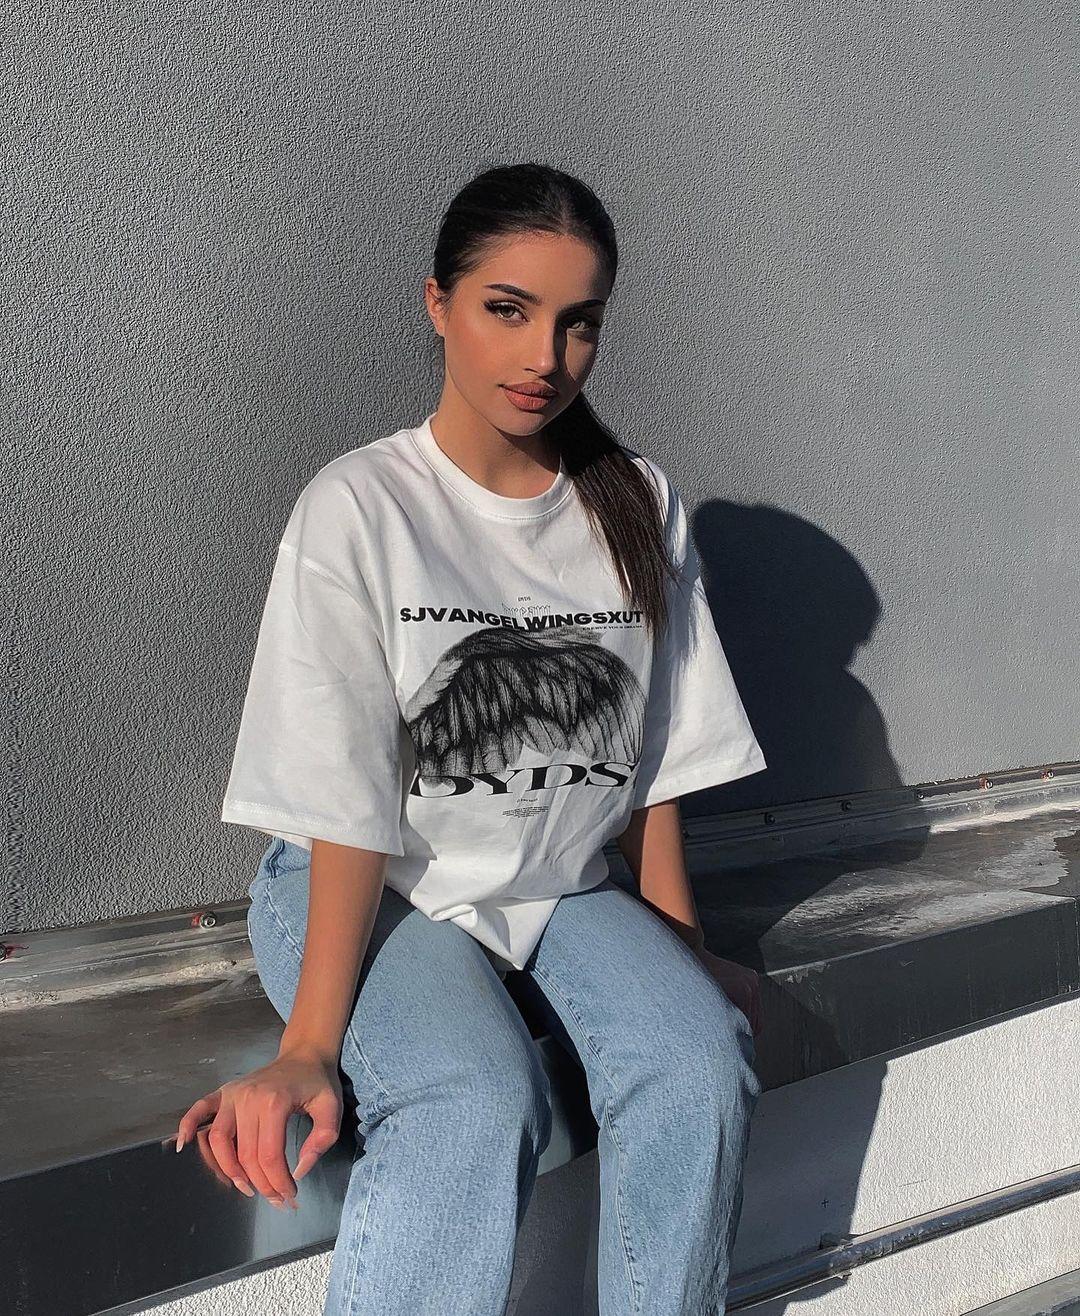 Leyla-Melina-Wallpapers-Insta-Fit-Bio-24